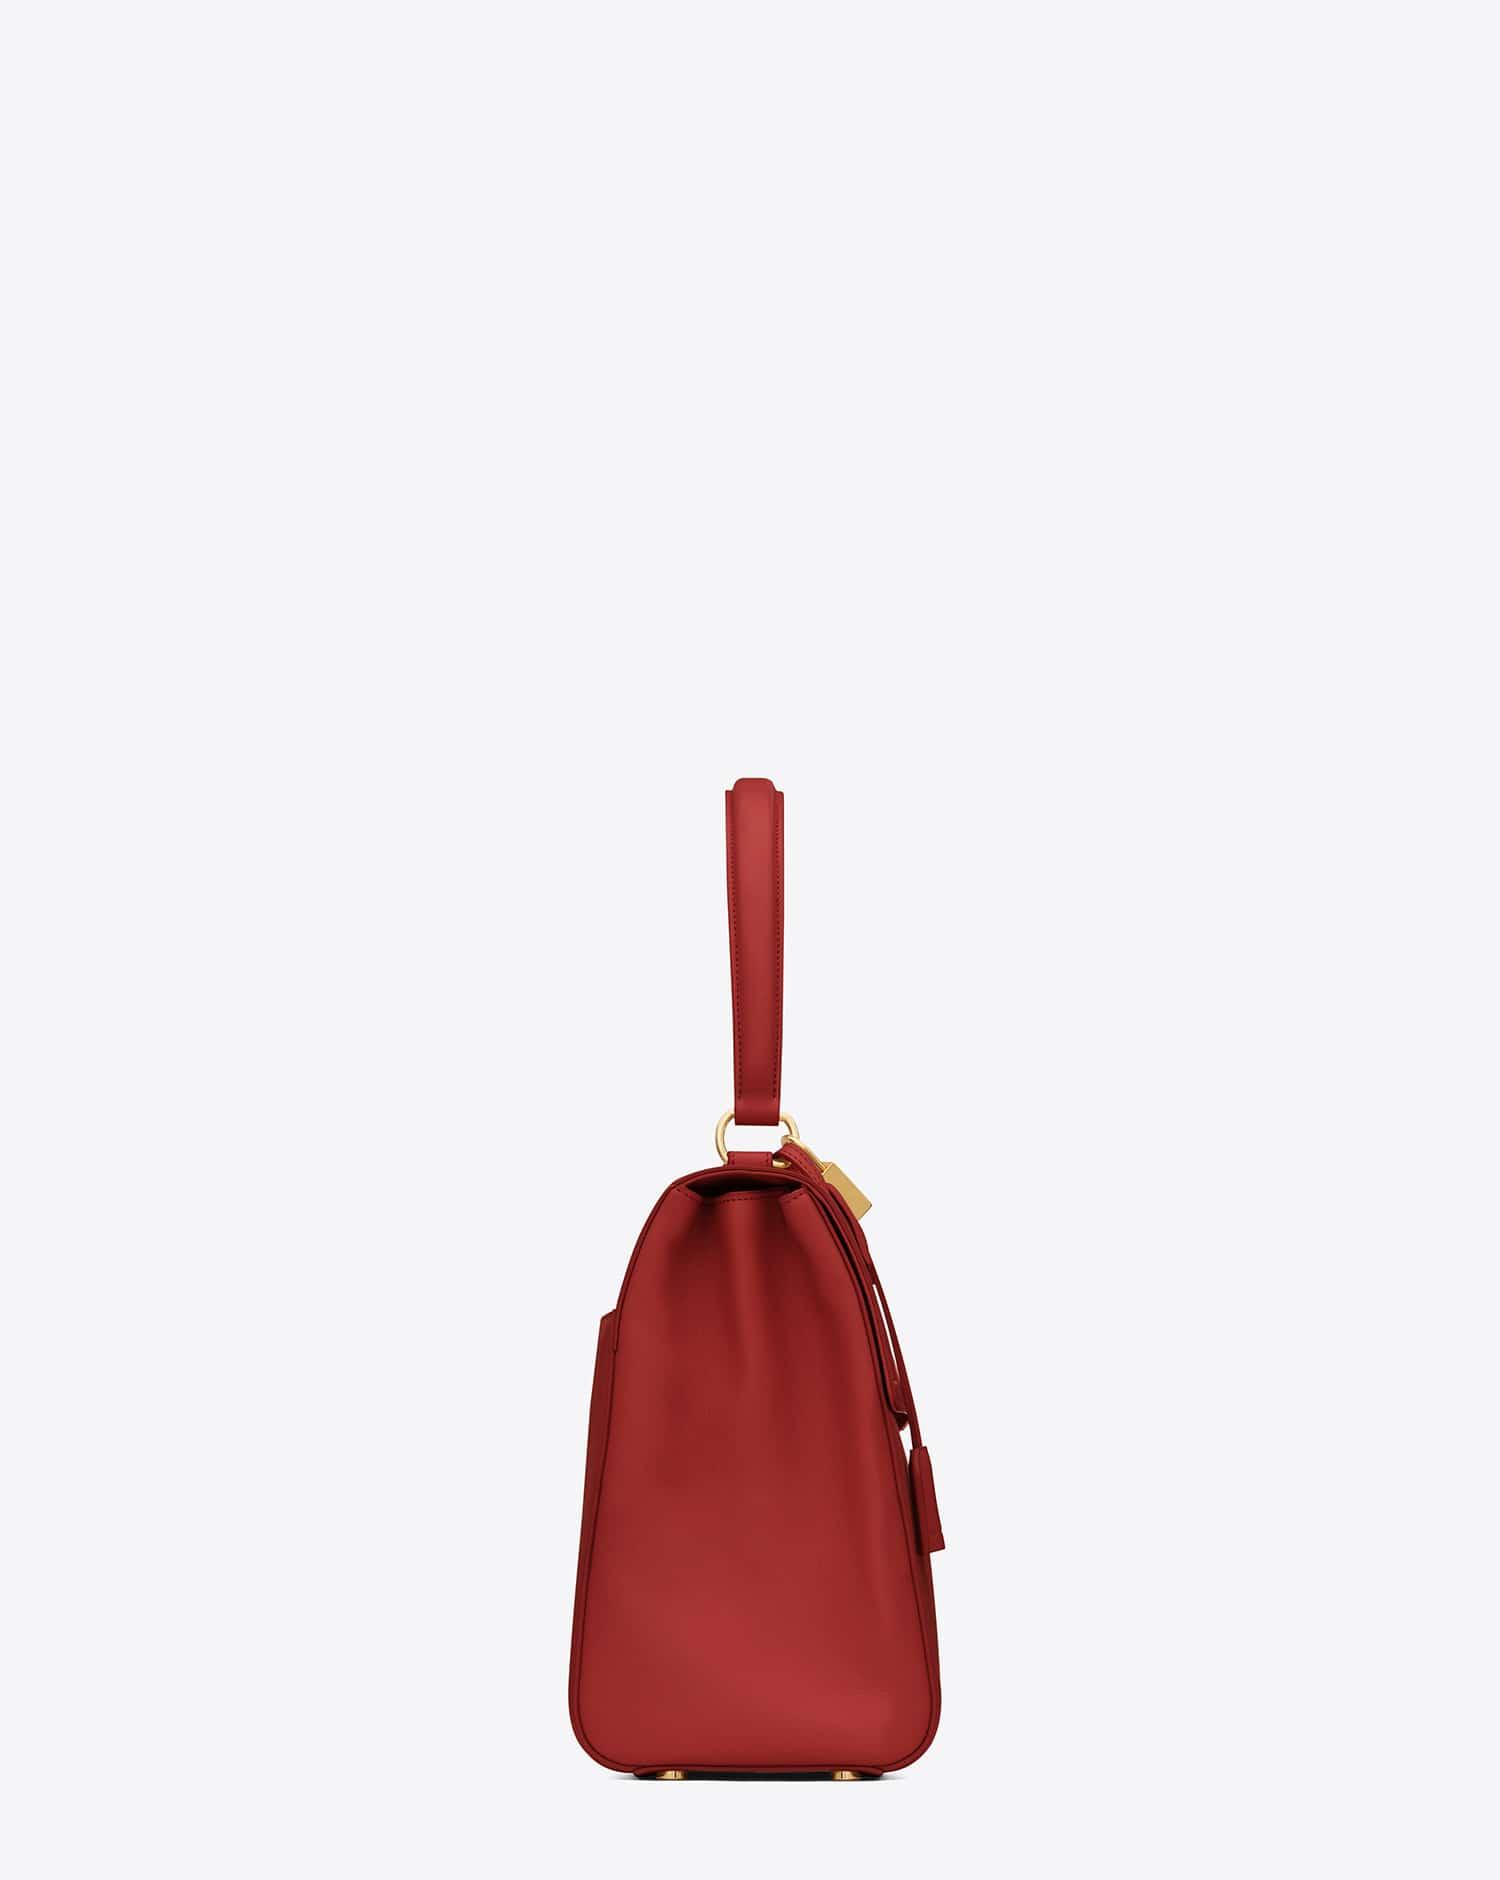 Saint Laurent Moujik Top Handle Bag Replaces the Muse Two Bag ... 918236ad5c51c